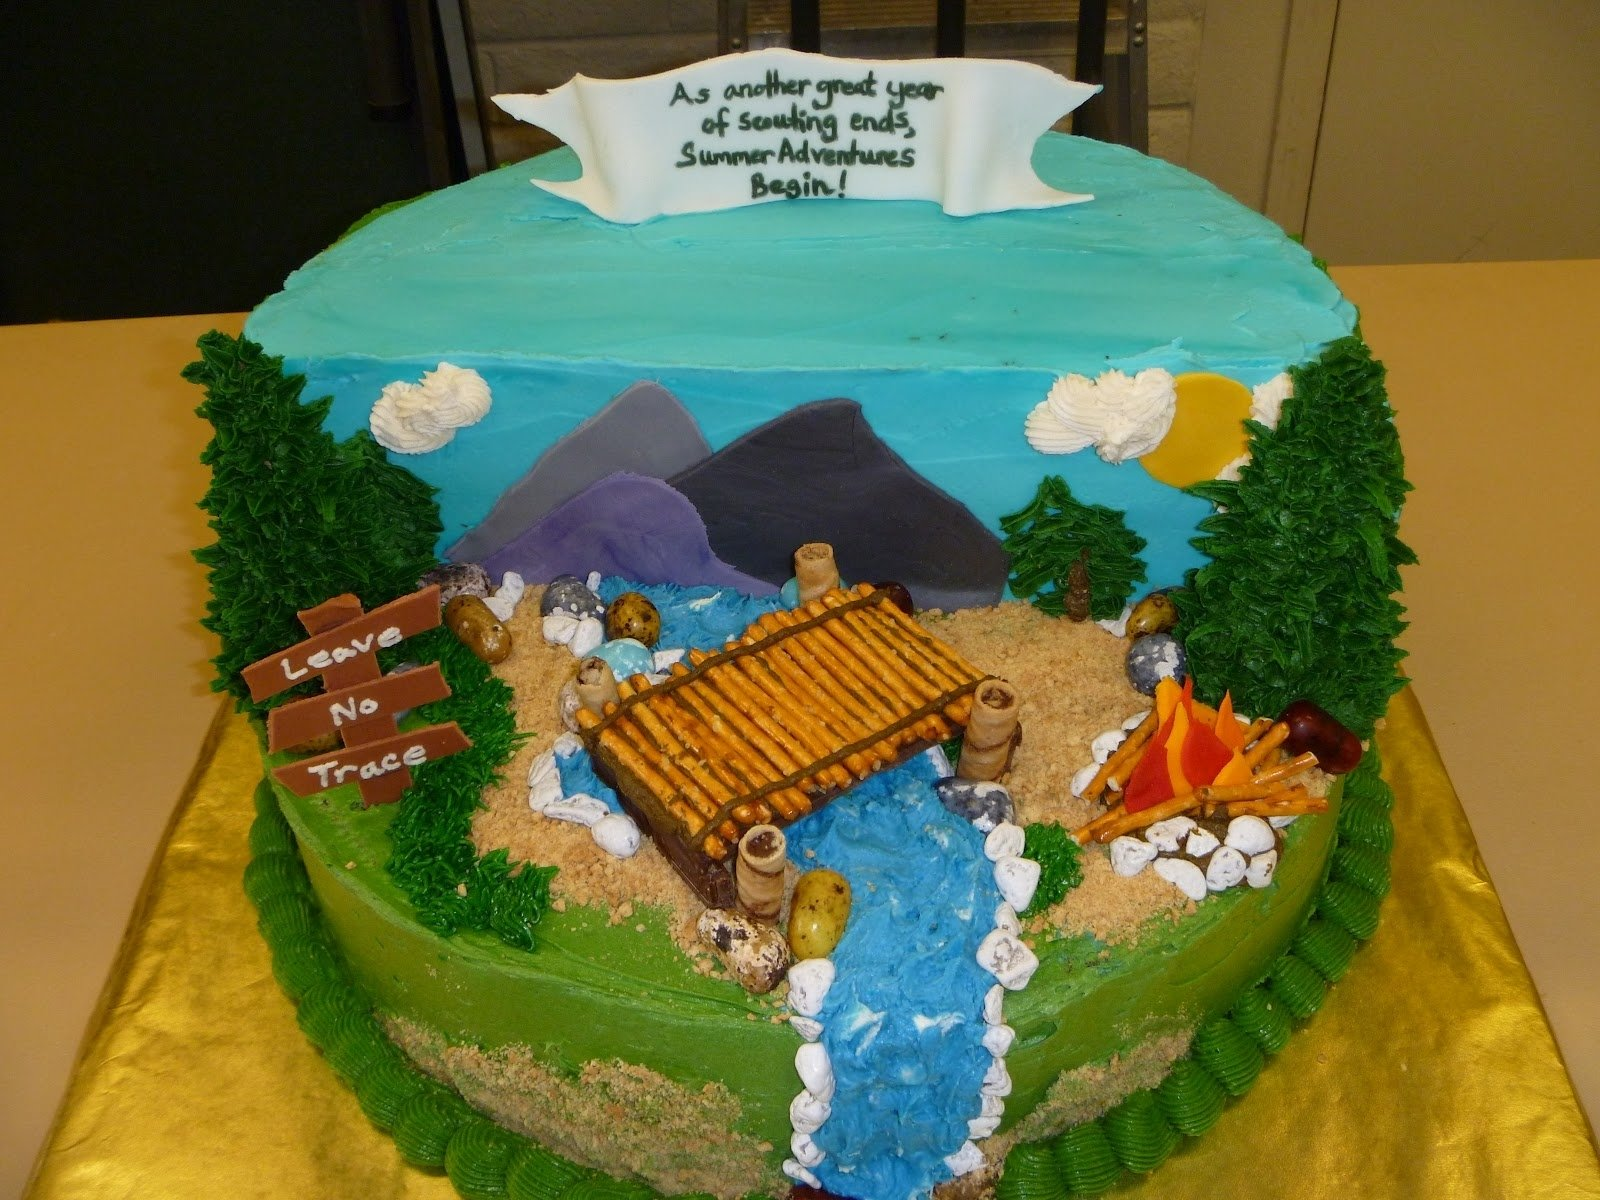 10 Cute Cub Scout Cake Decorating Ideas dreaming in buttercream cub scout crossover cake 2020